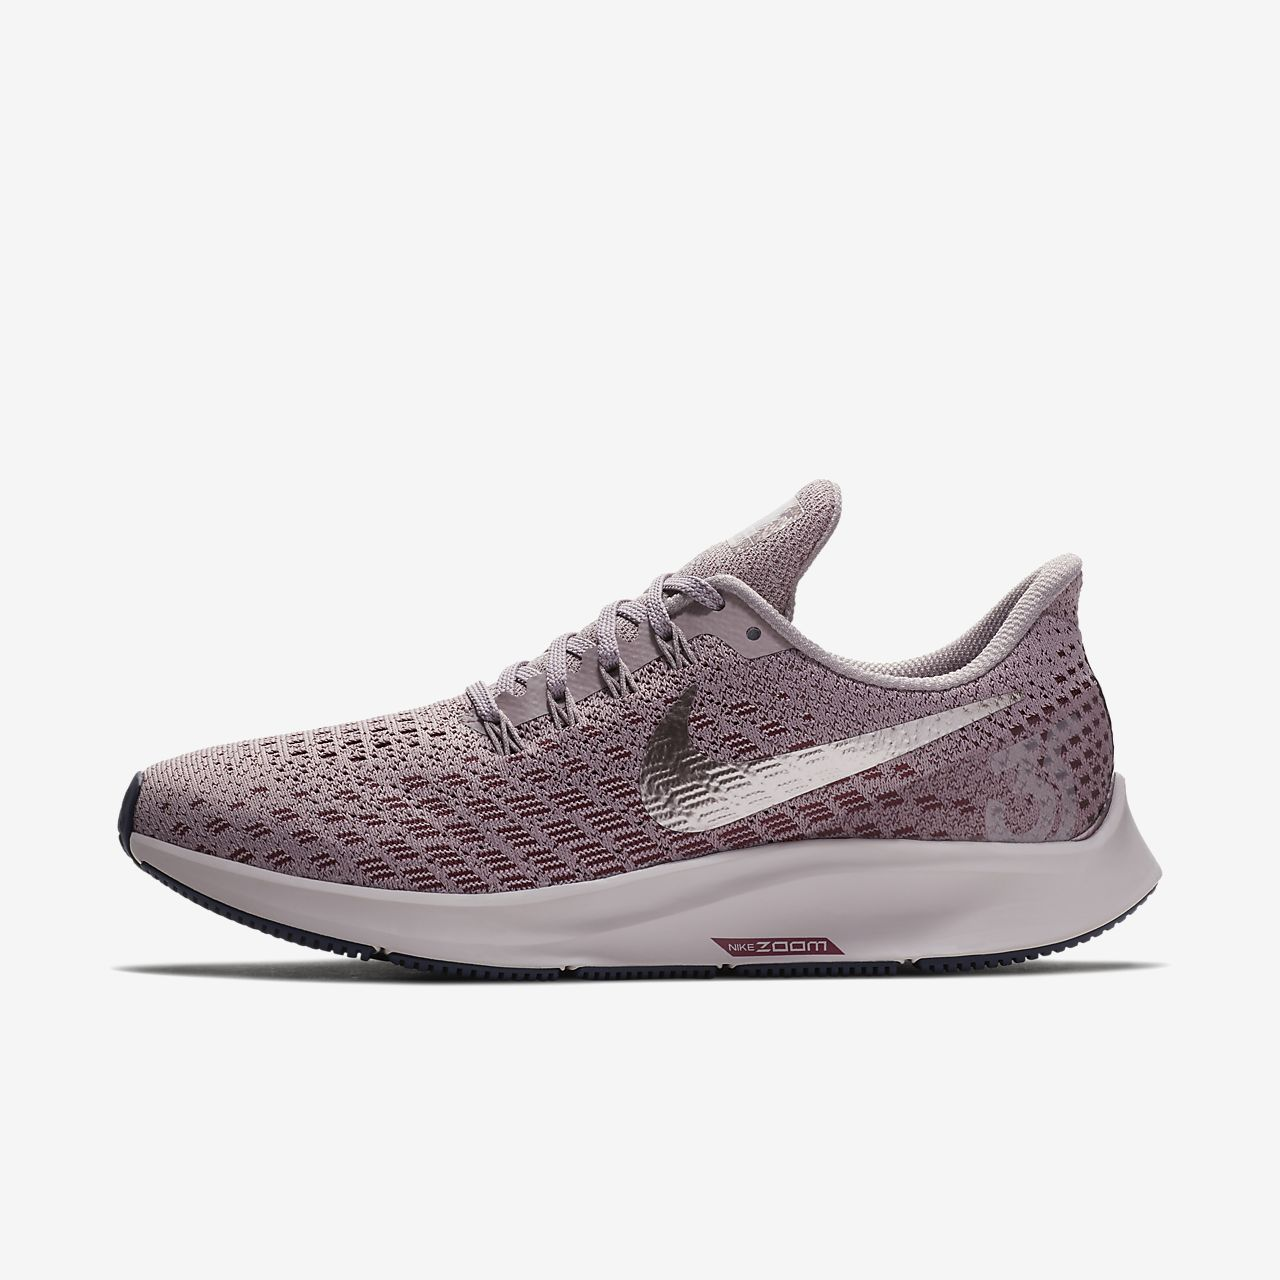 Nike WMNS Air Zoom Pegasus 35, Größe 38,5 Damen Laufschuhe